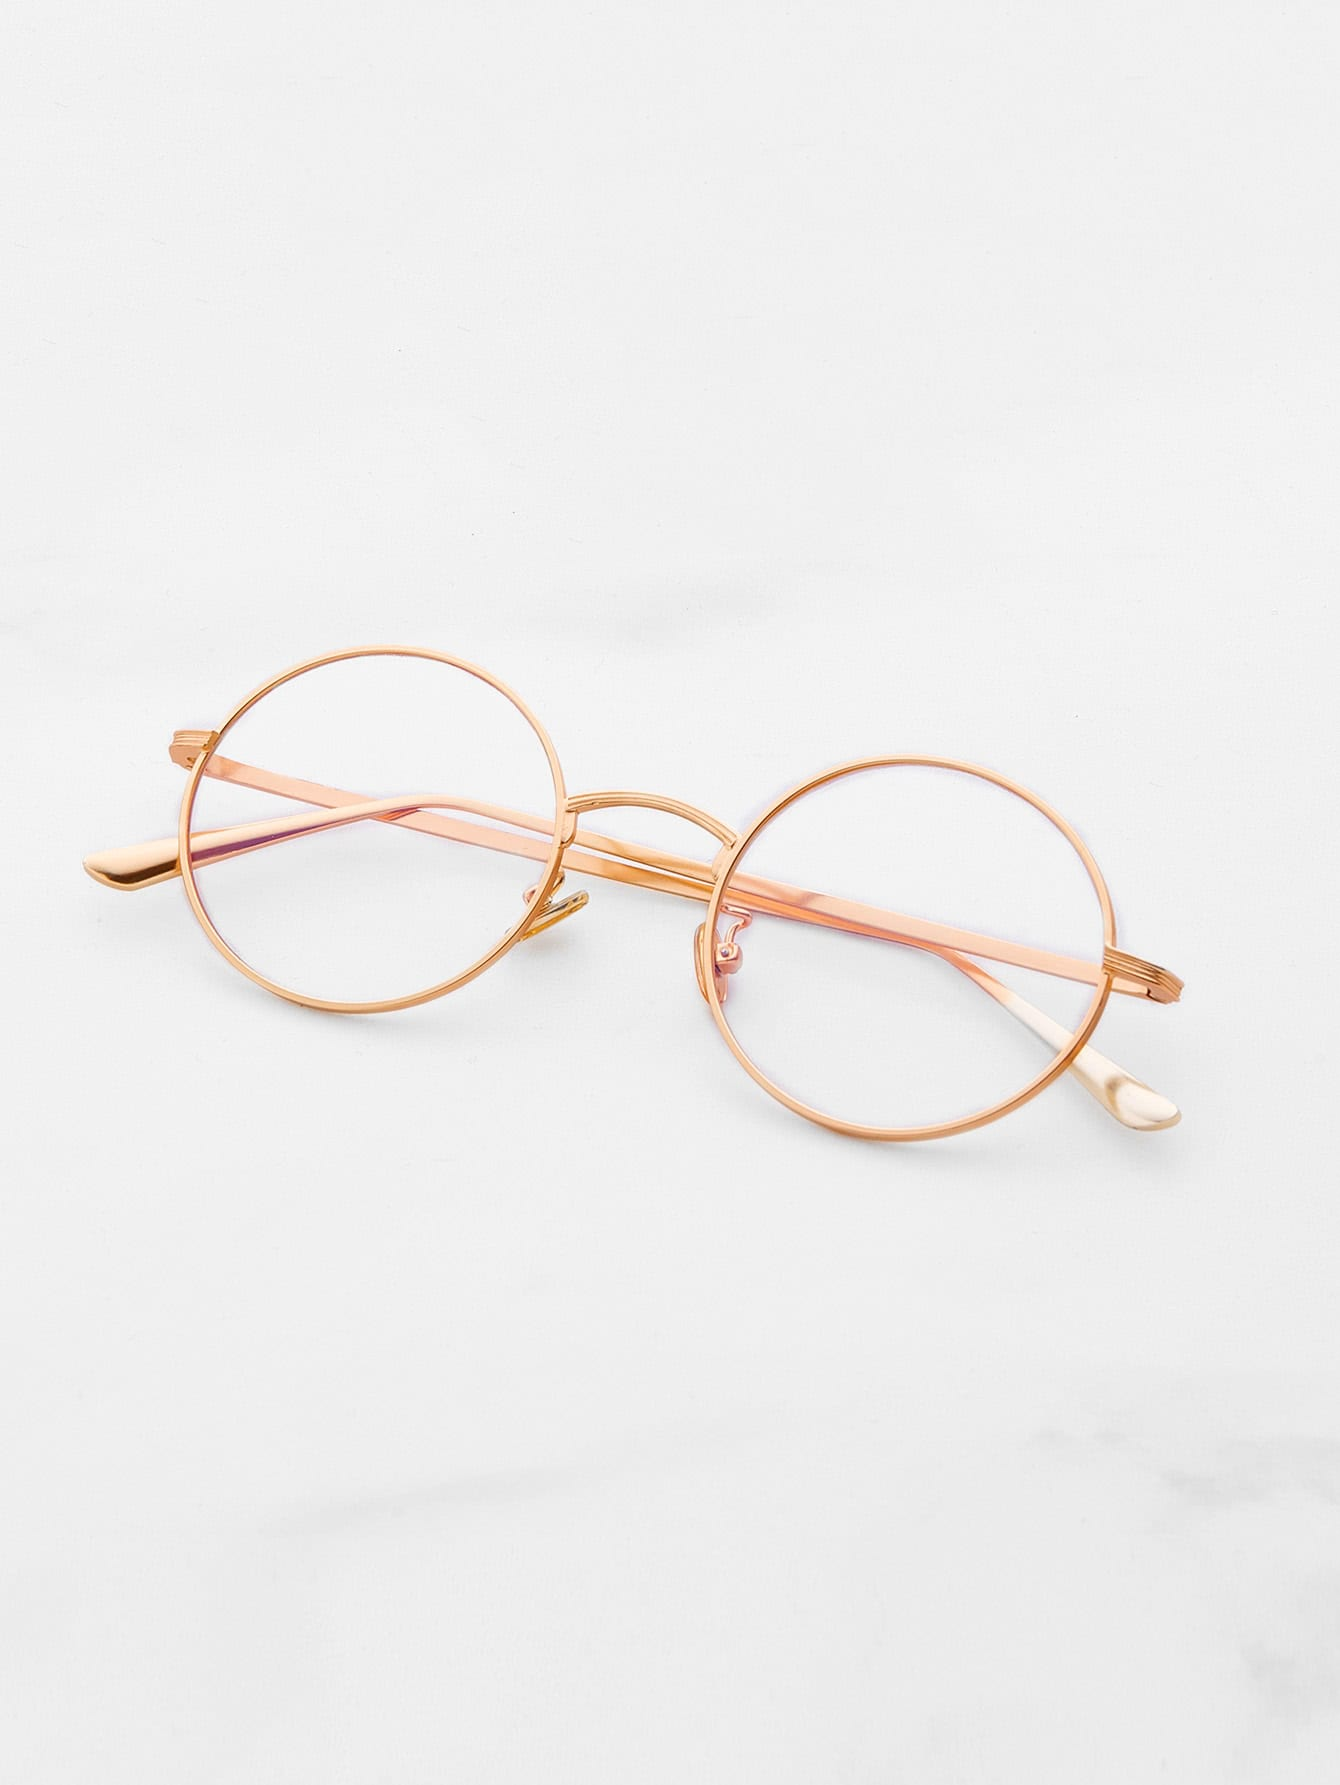 e8fd2abcb9 Clear Lens Circular Glasses - Bitterroot Public Library